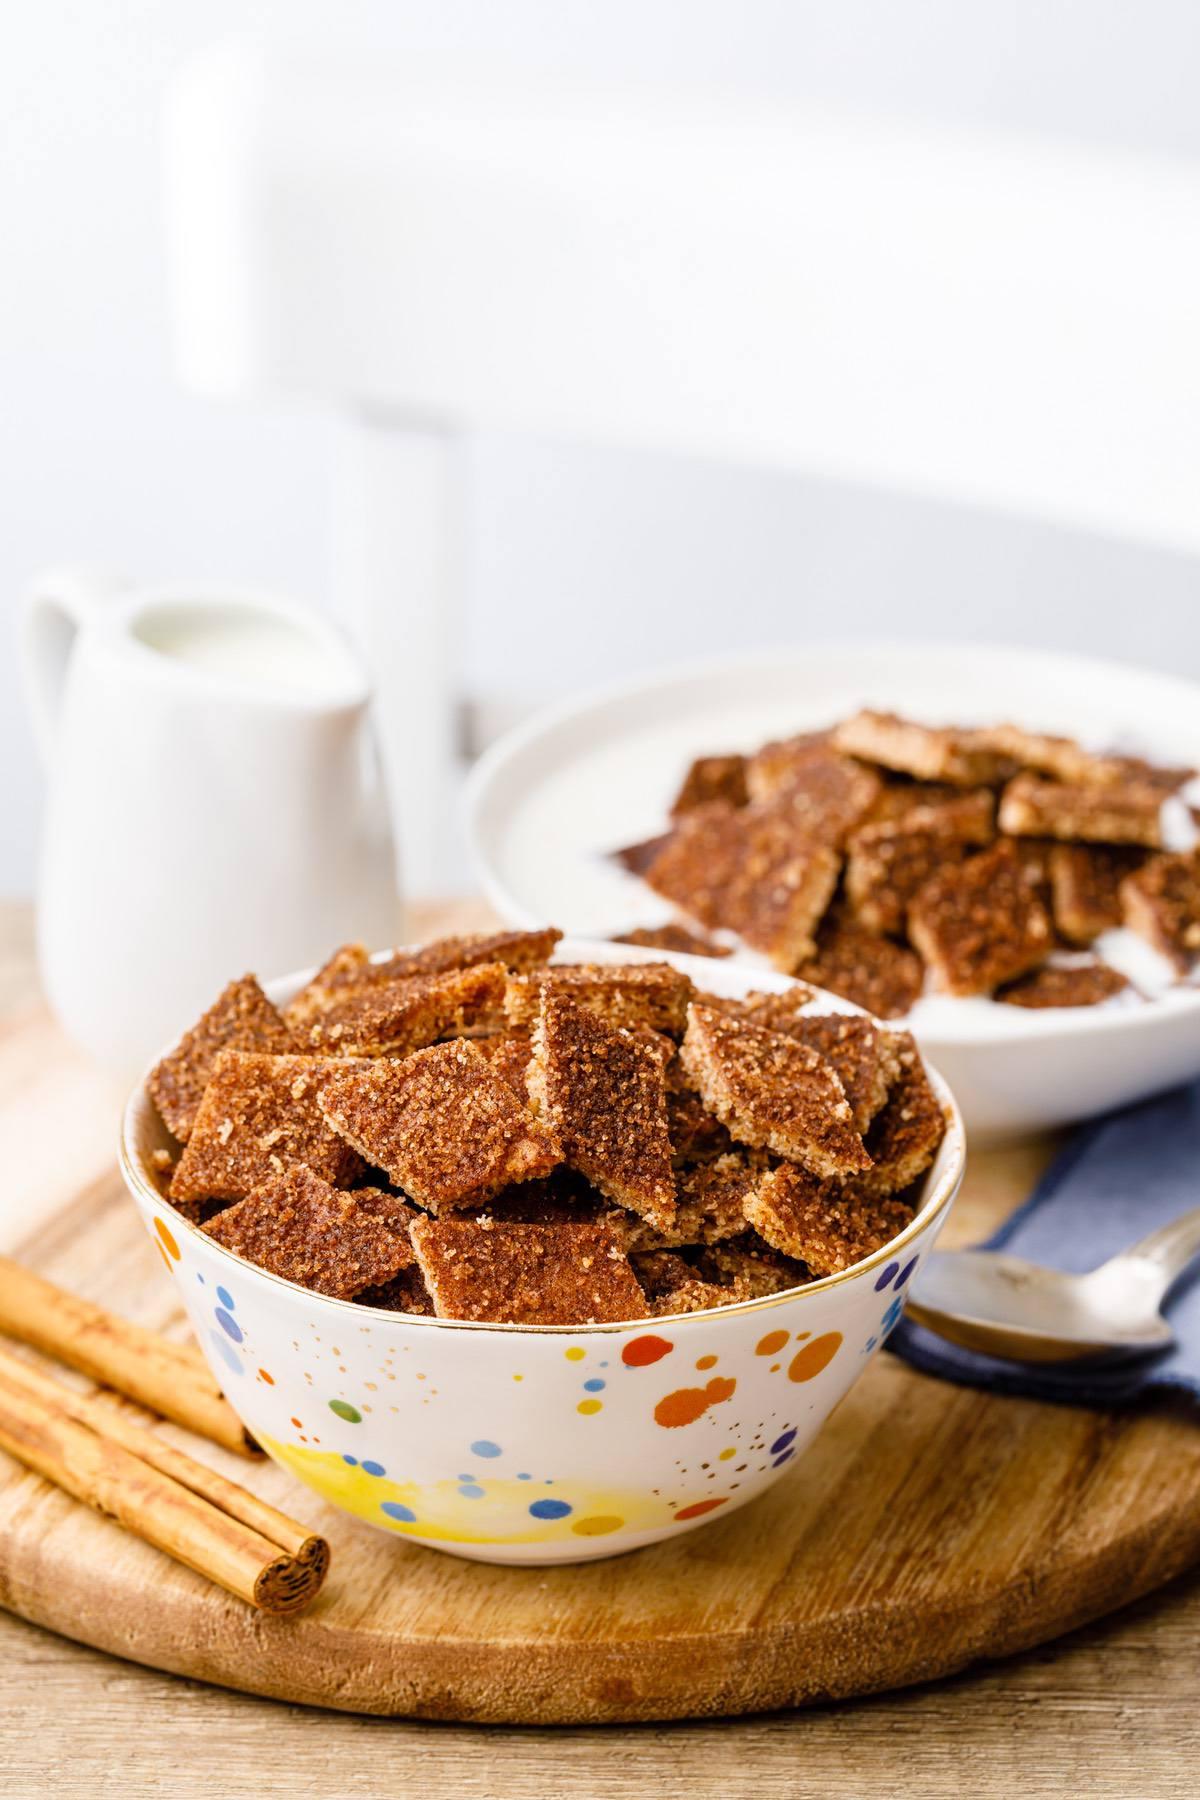 Keto Cinnamon Cereal